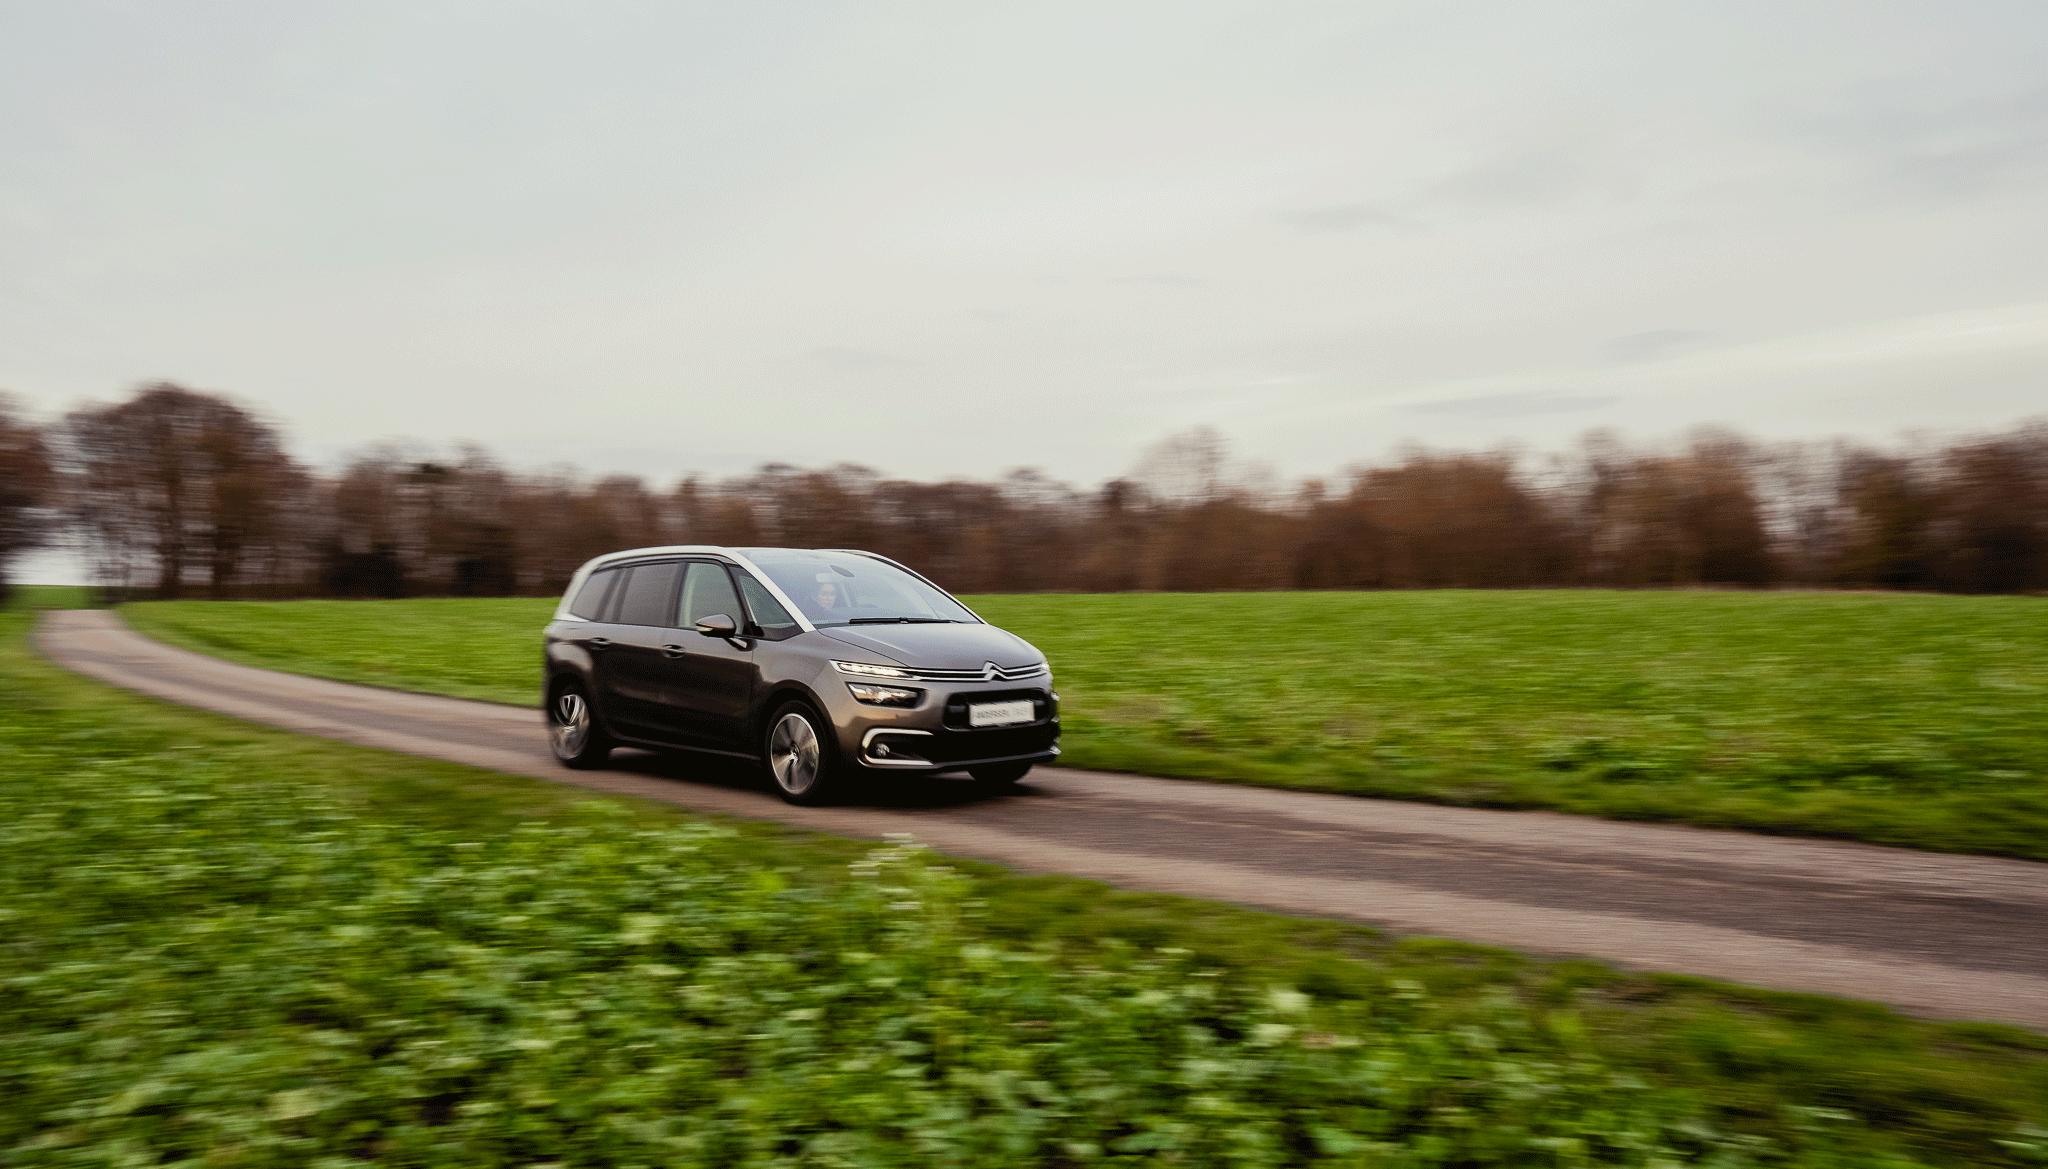 Citroën Grand C4 Picasso Intensive og Seduction tilbud | Andersen Biler